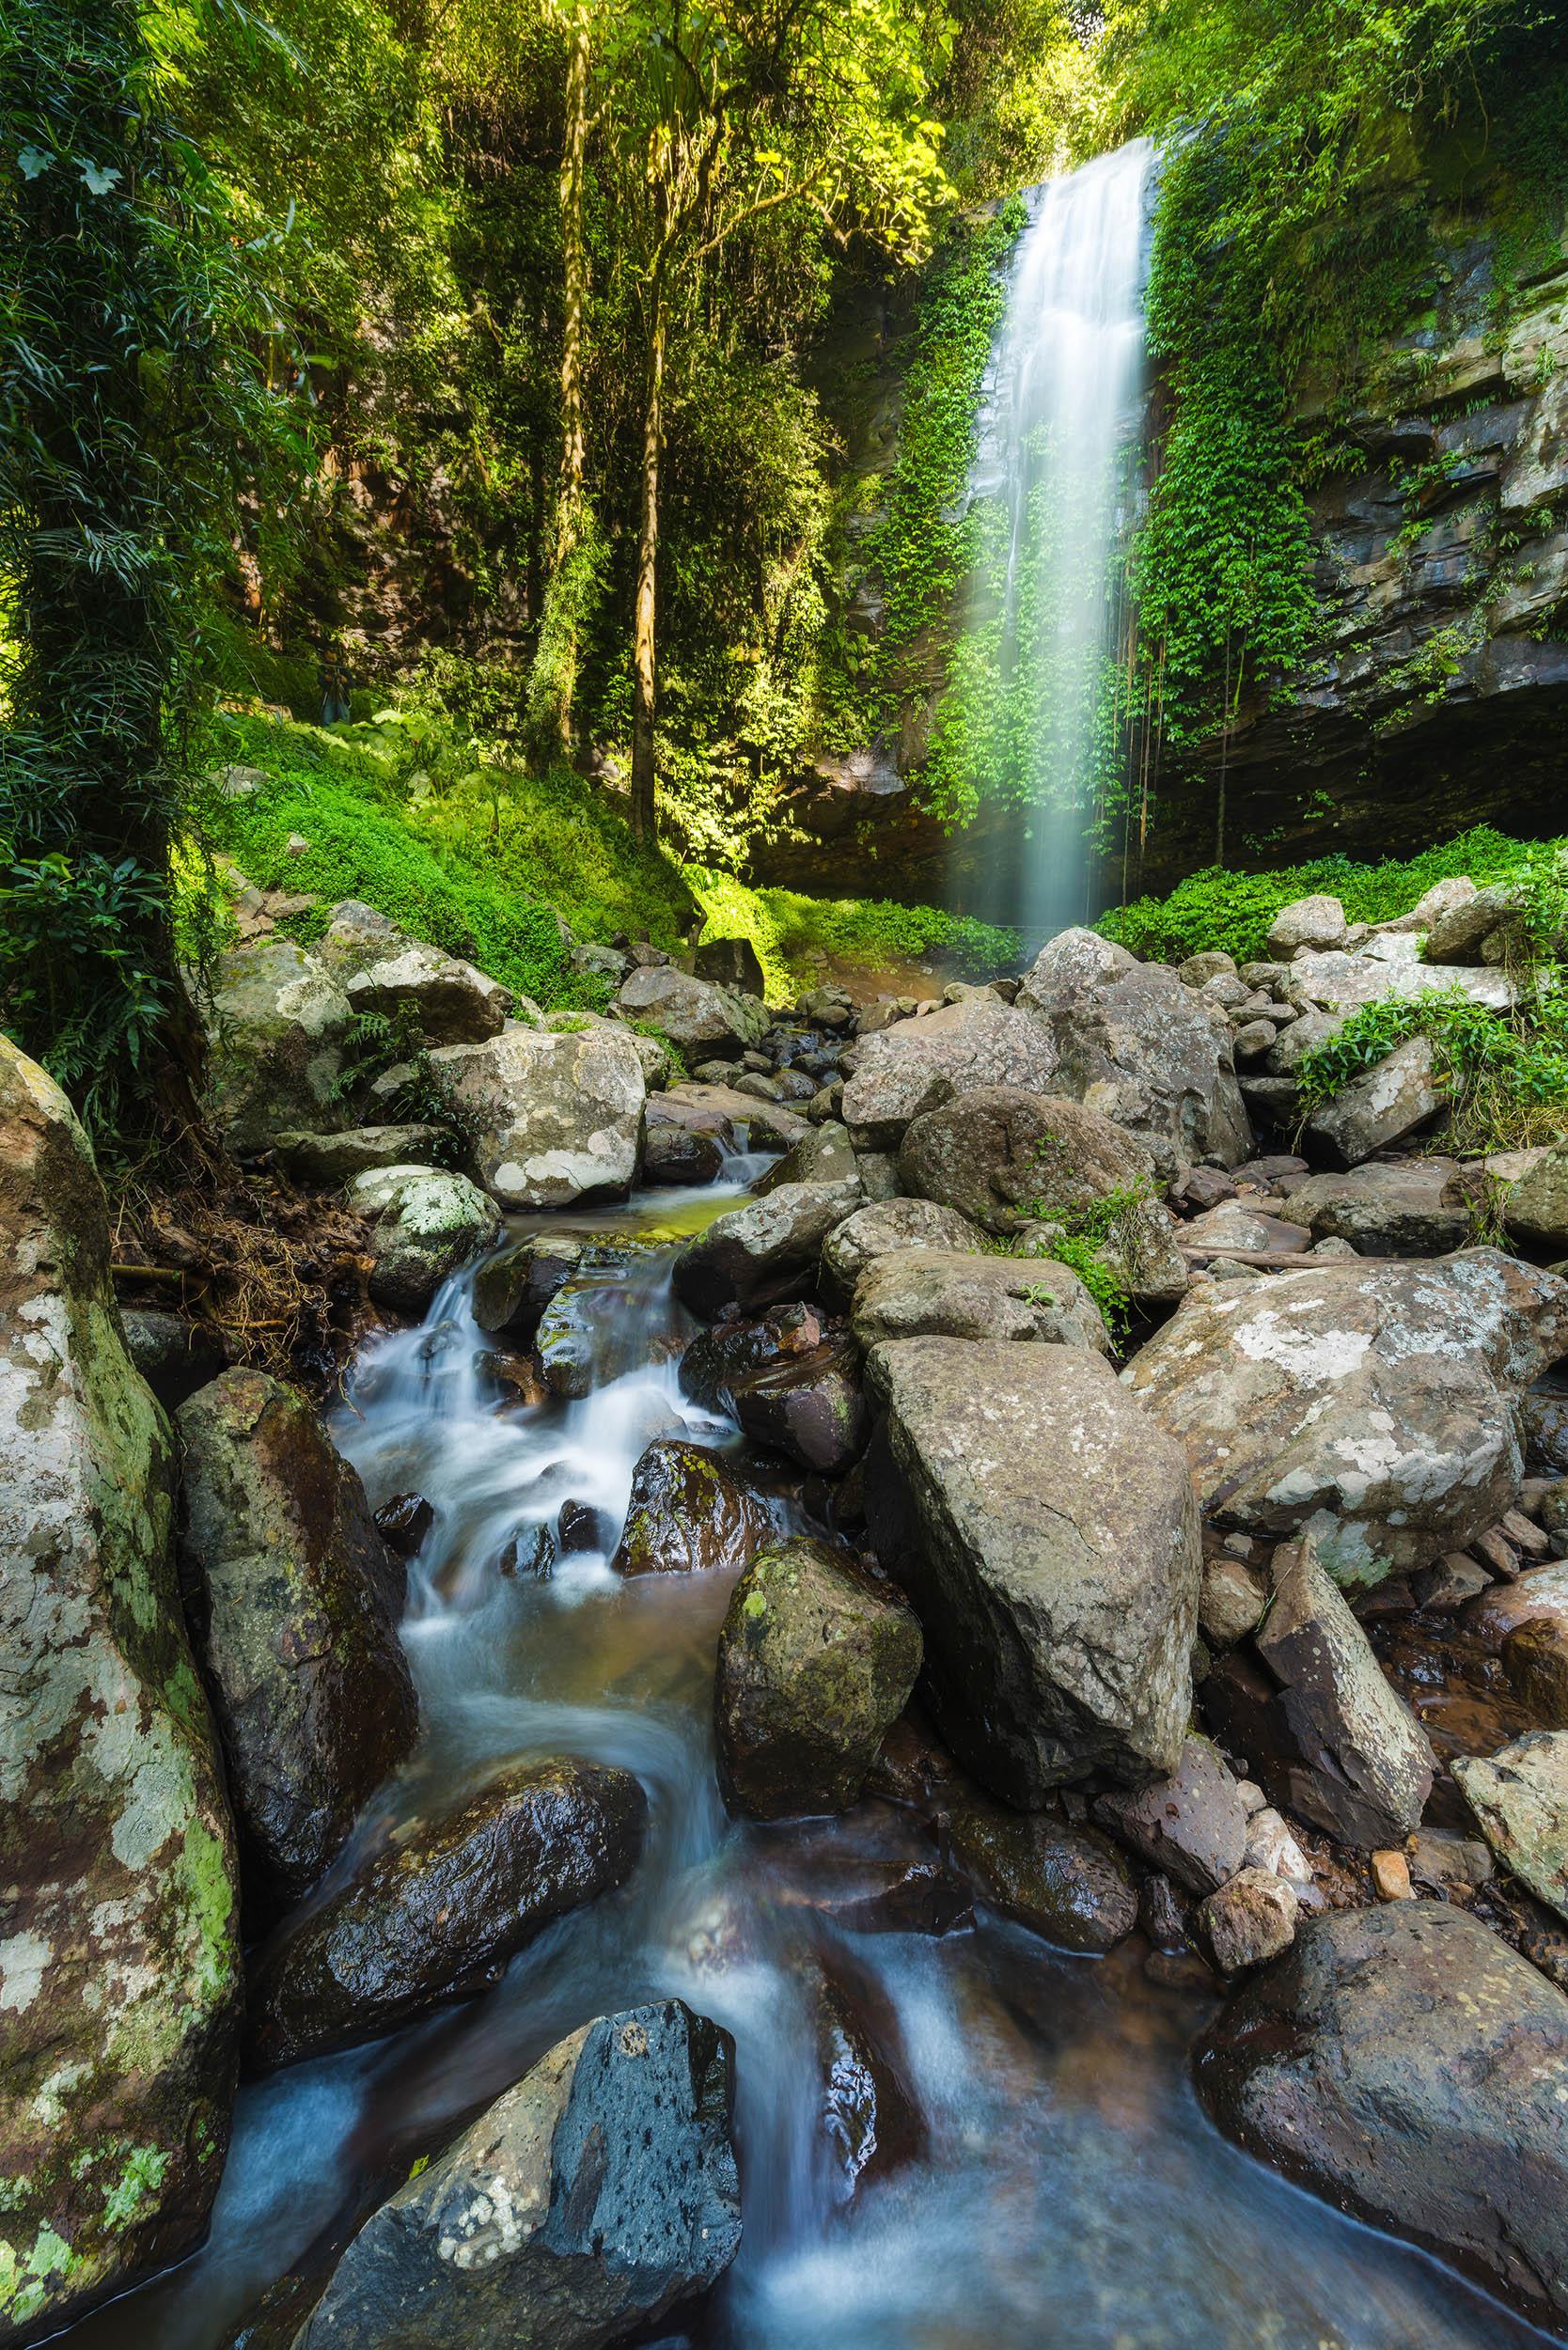 The majestic Crystal Shower Falls in Dorrigo National Park.